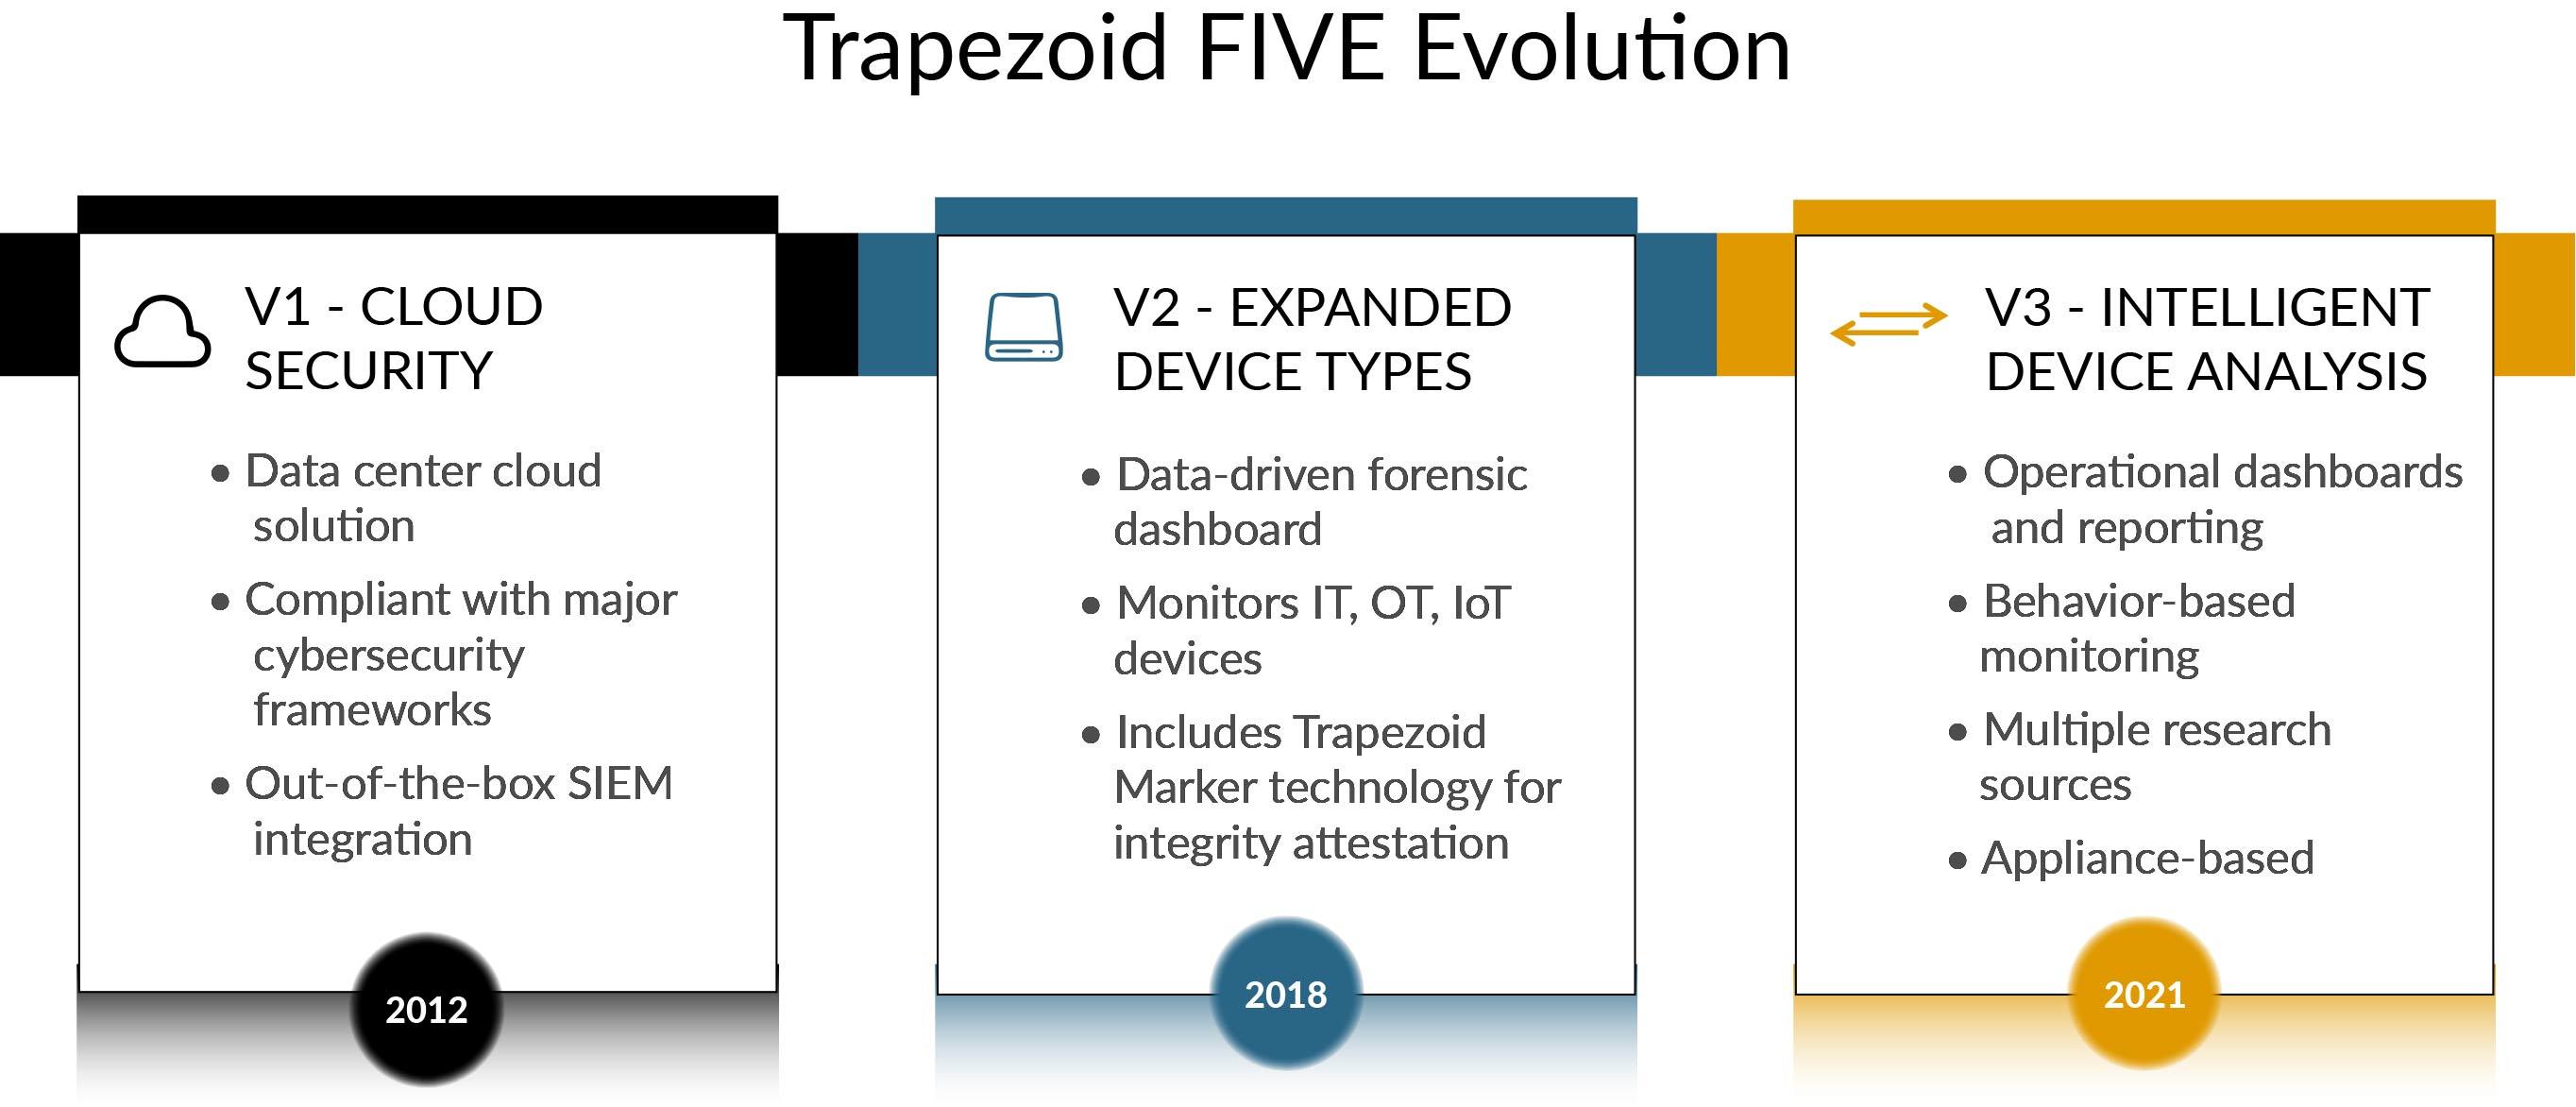 Trapezoid FIVE Evolution